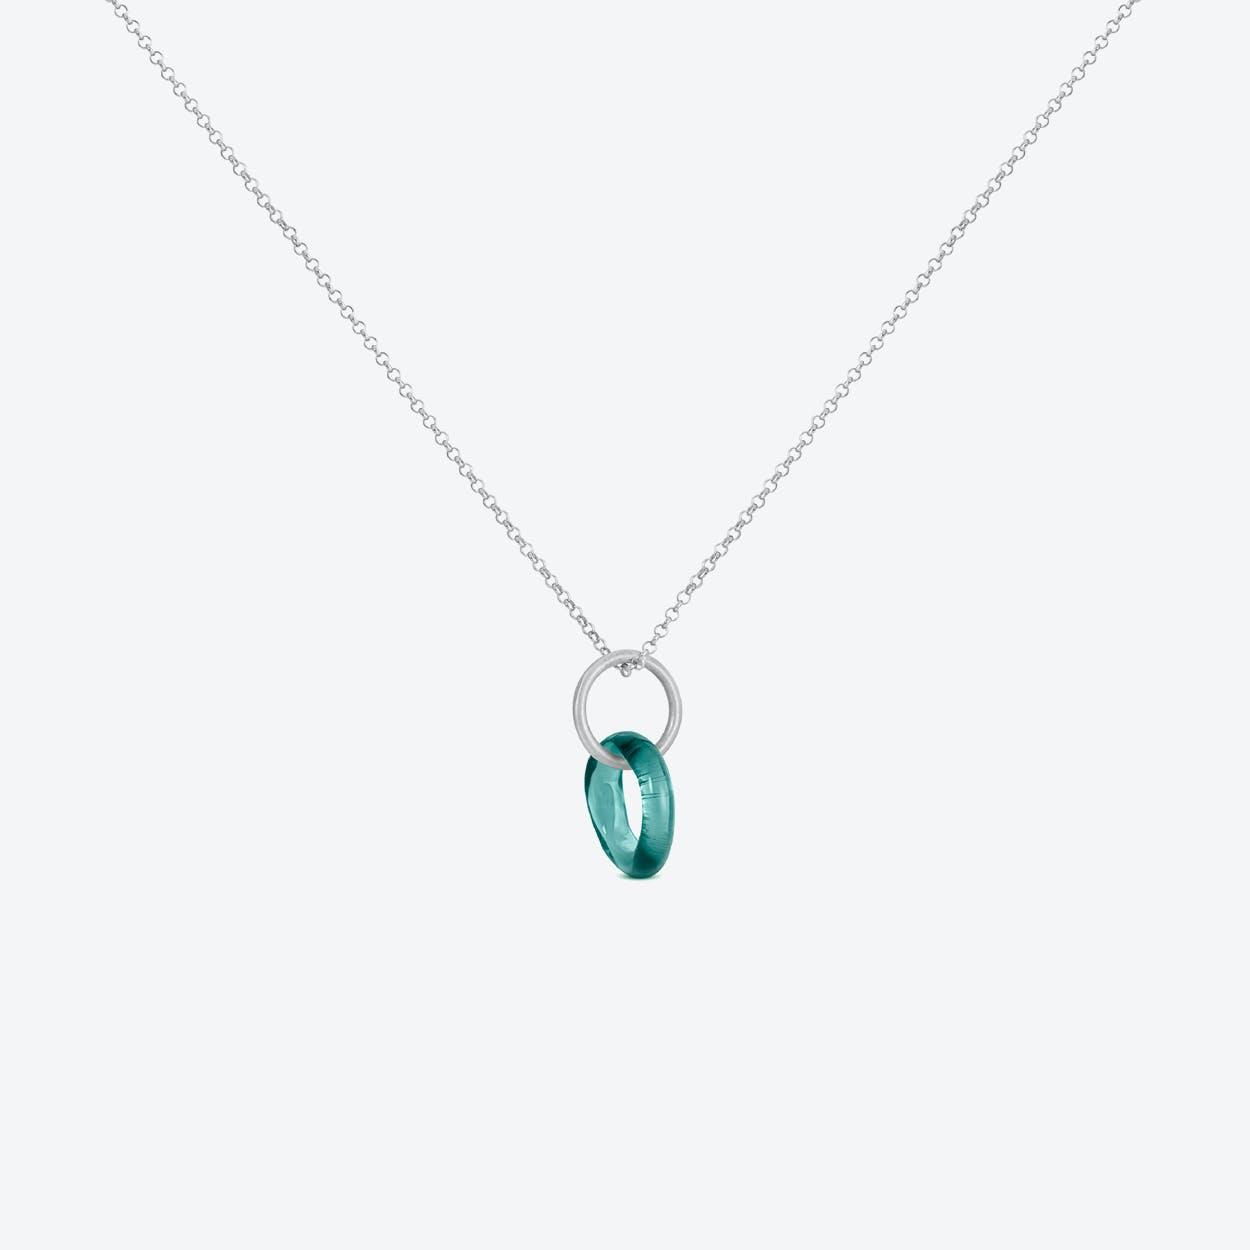 Caramel Necklaces in Sea-Blue